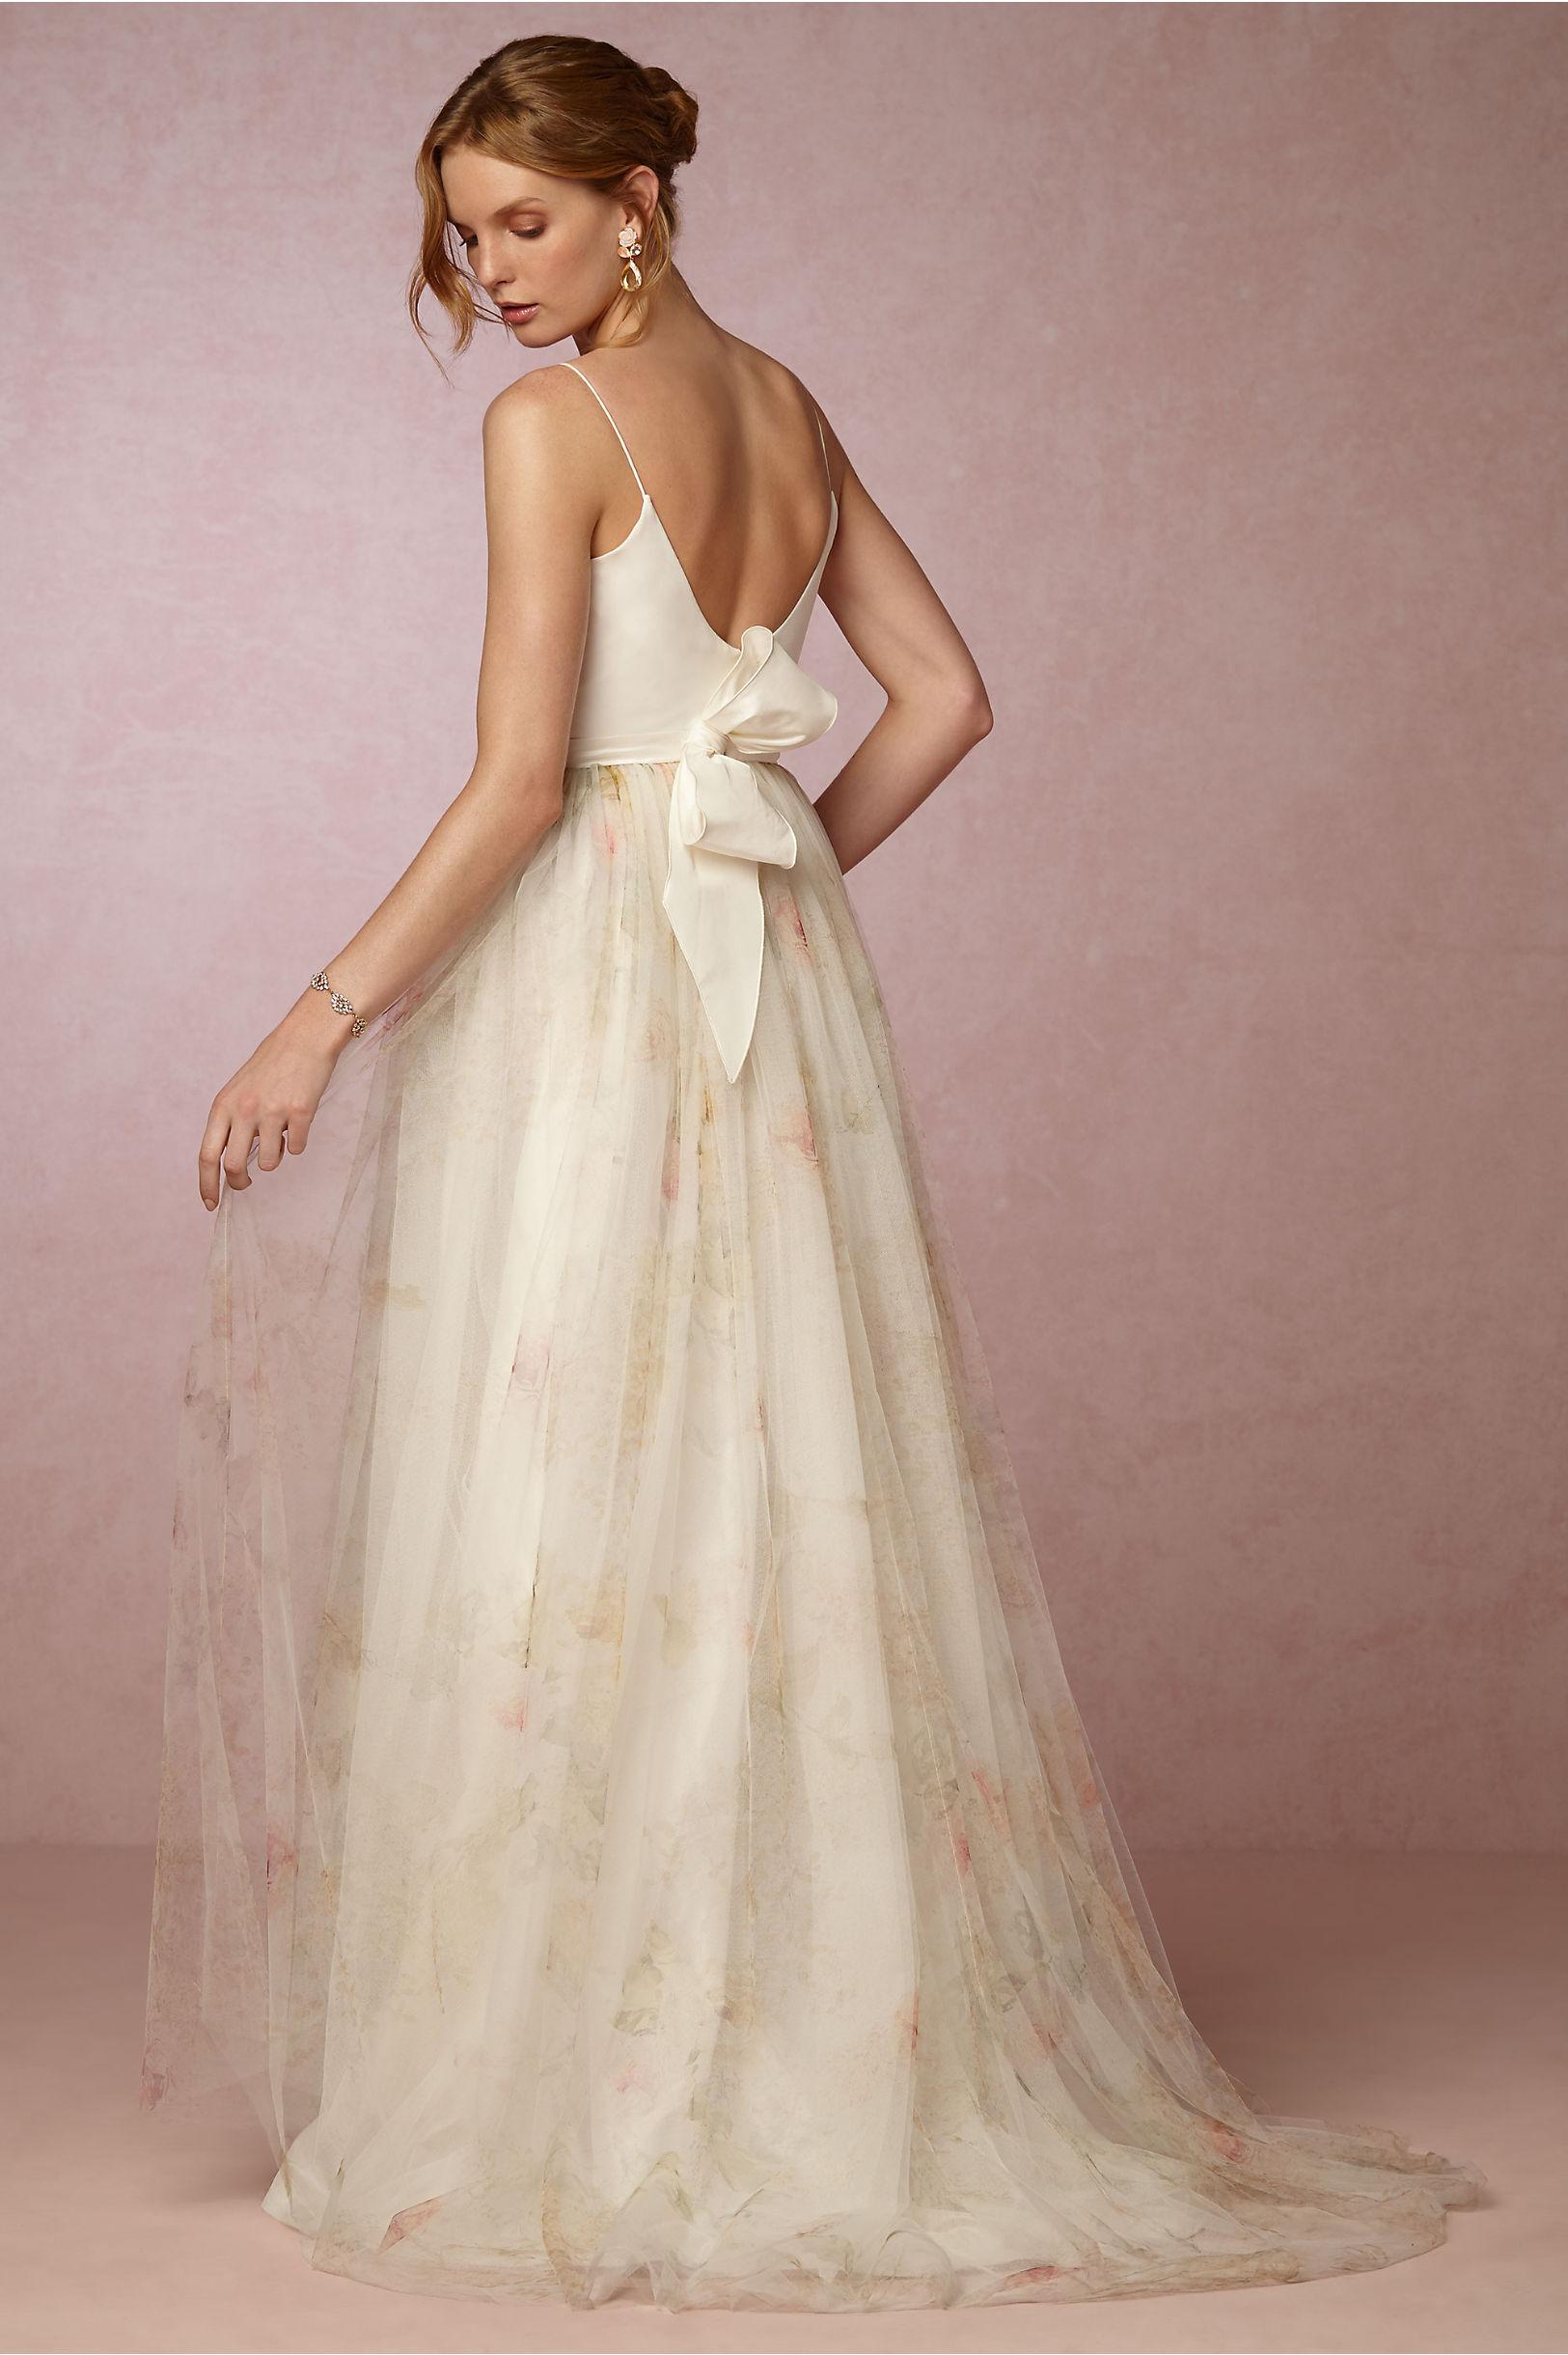 bhldn floral wedding dress in pensacola